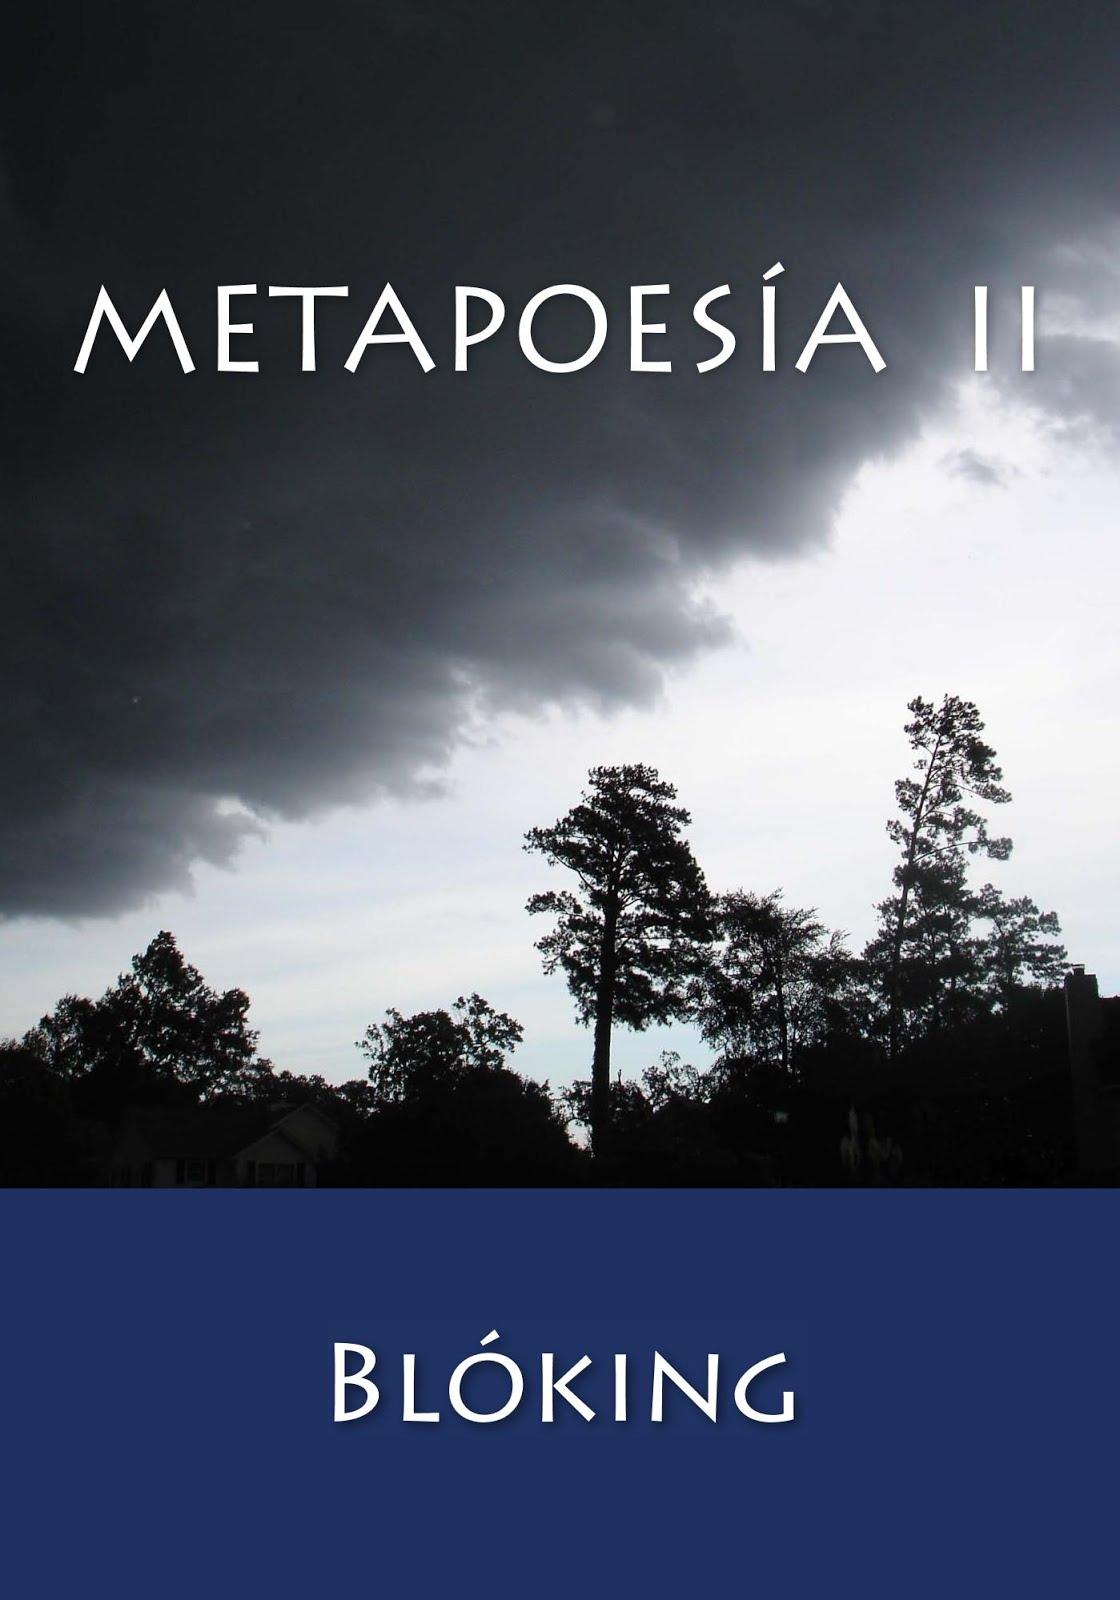 #Obra 31 - Metapoesía II